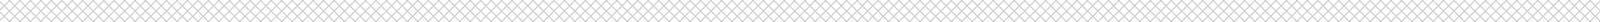 pattern_grid.png